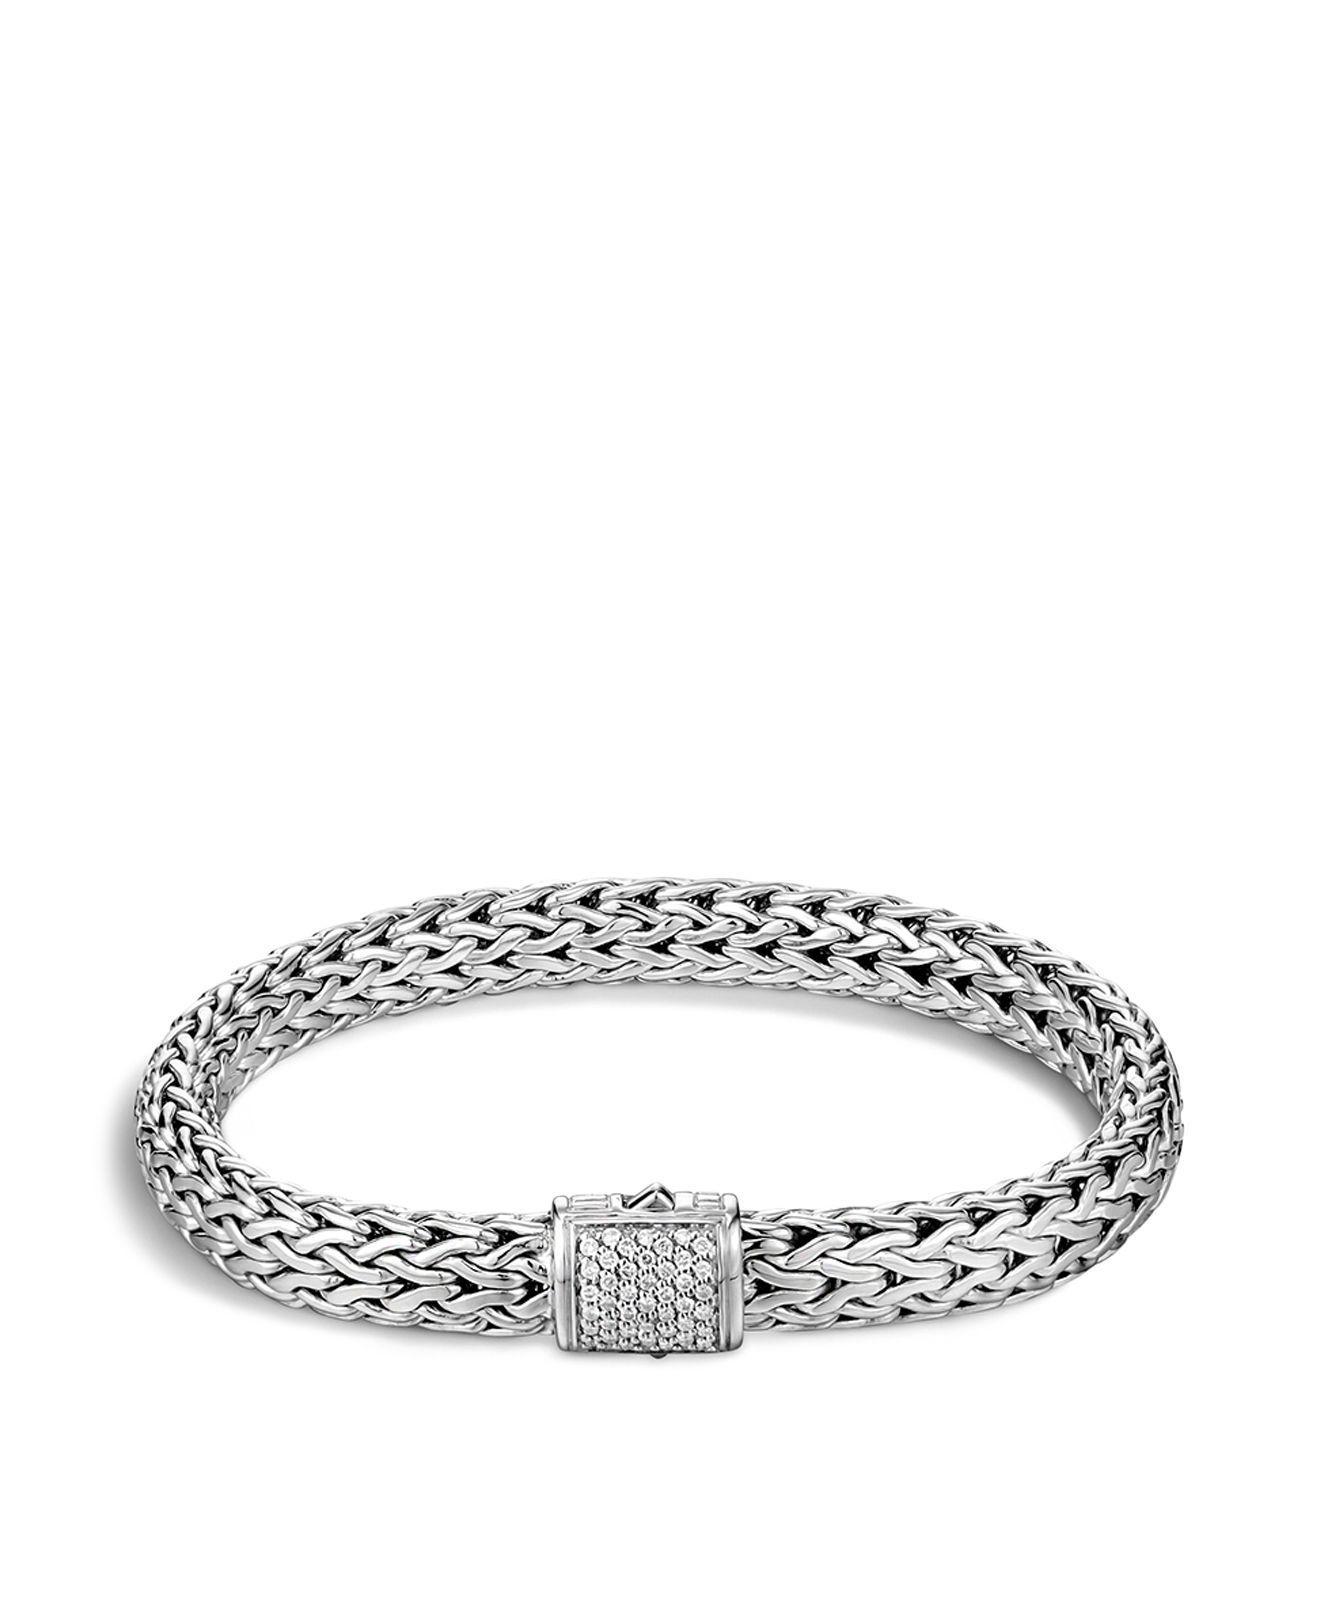 John Hardy Classic Chain Hammered Diamond Tip Cuff Bracelet Lb9AsR